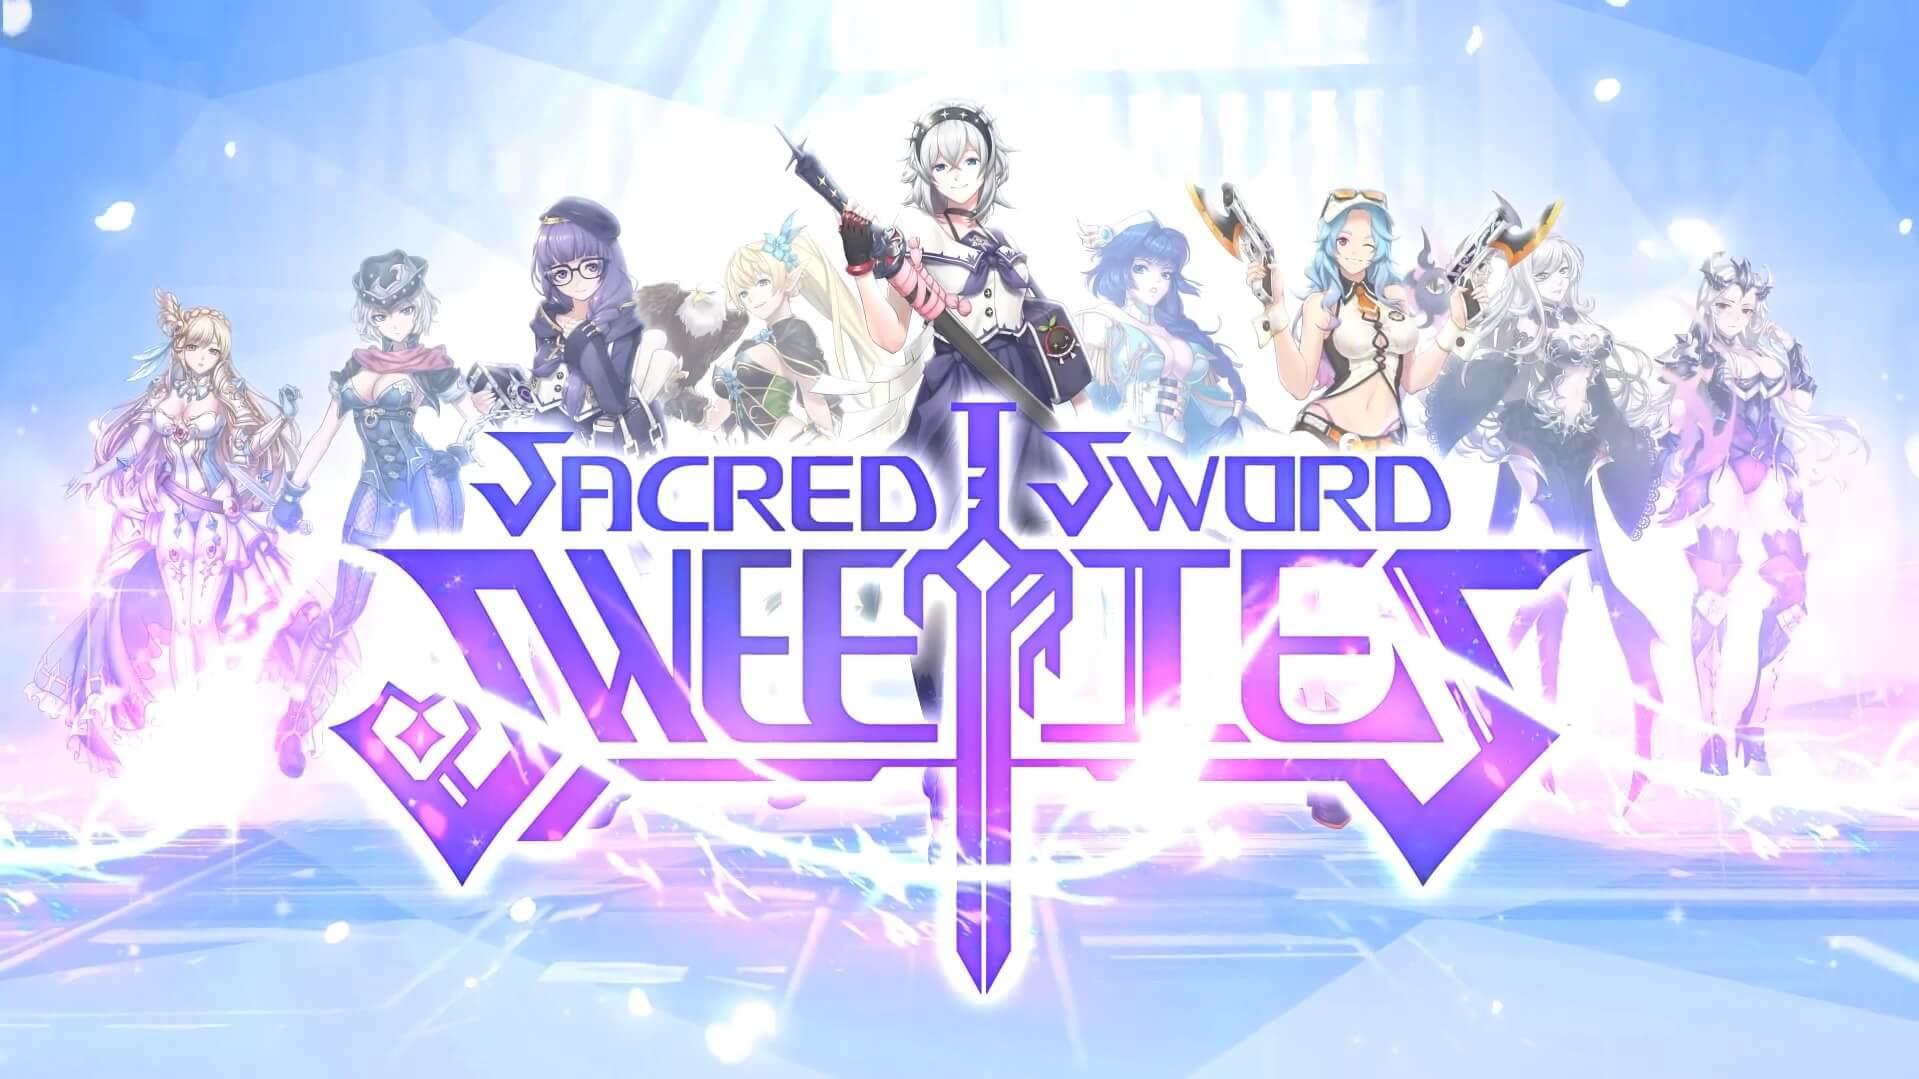 Sacred Sword Sweeties DL - Action Adventure Game